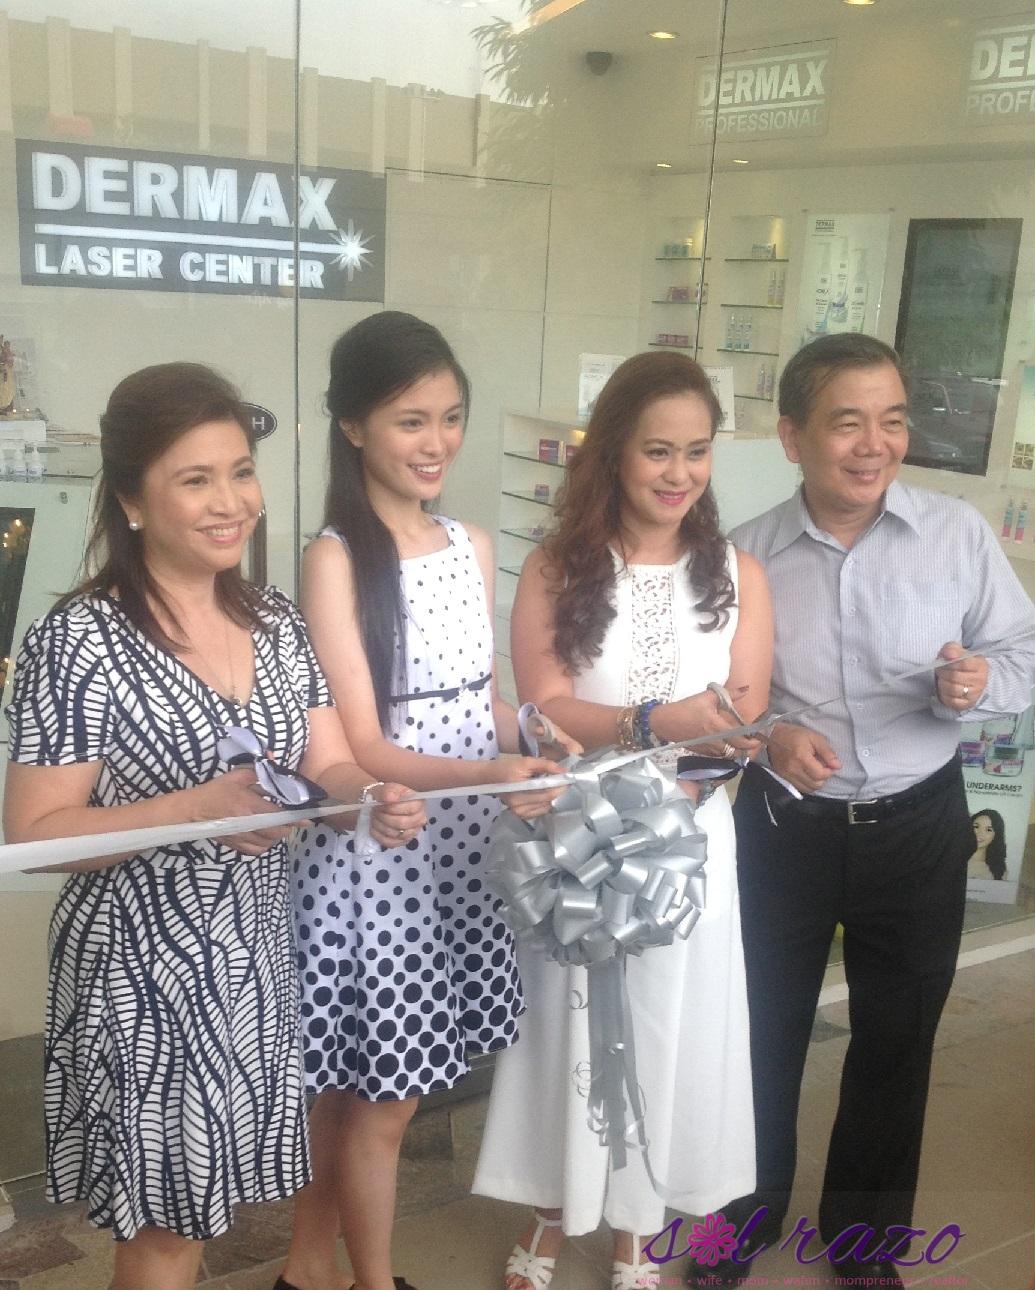 Dermax Laser Center Nuvali